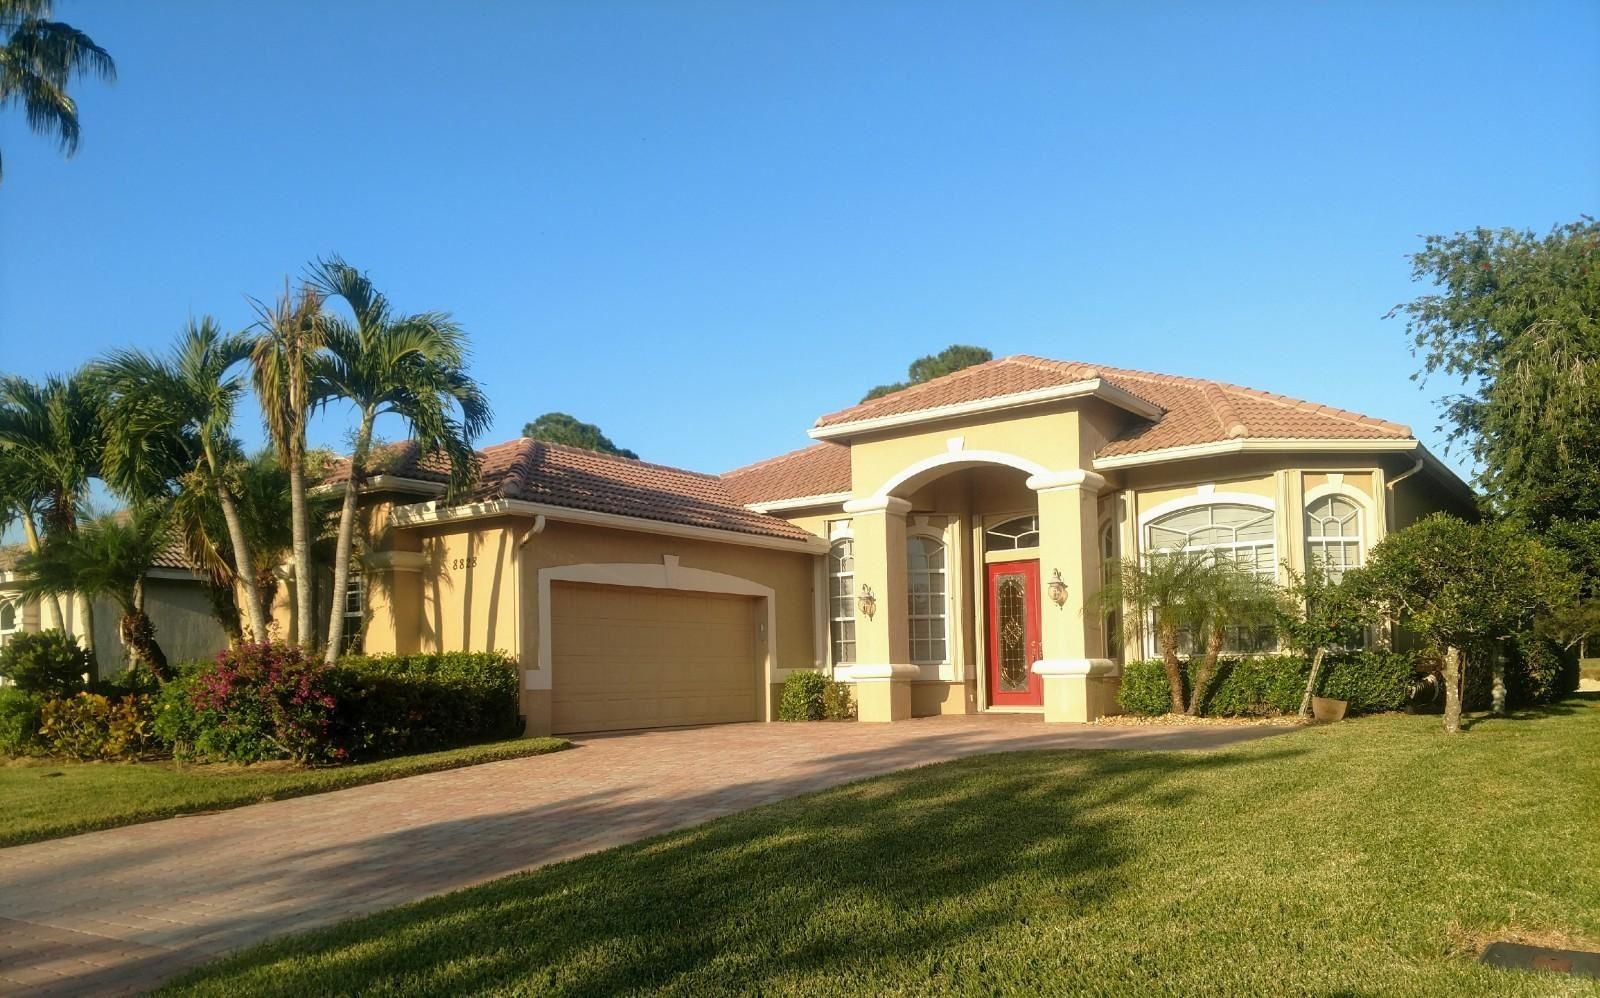 Photo of 8828 One Putt Place, Saint Lucie West, FL 34986 (MLS # RX-10685491)